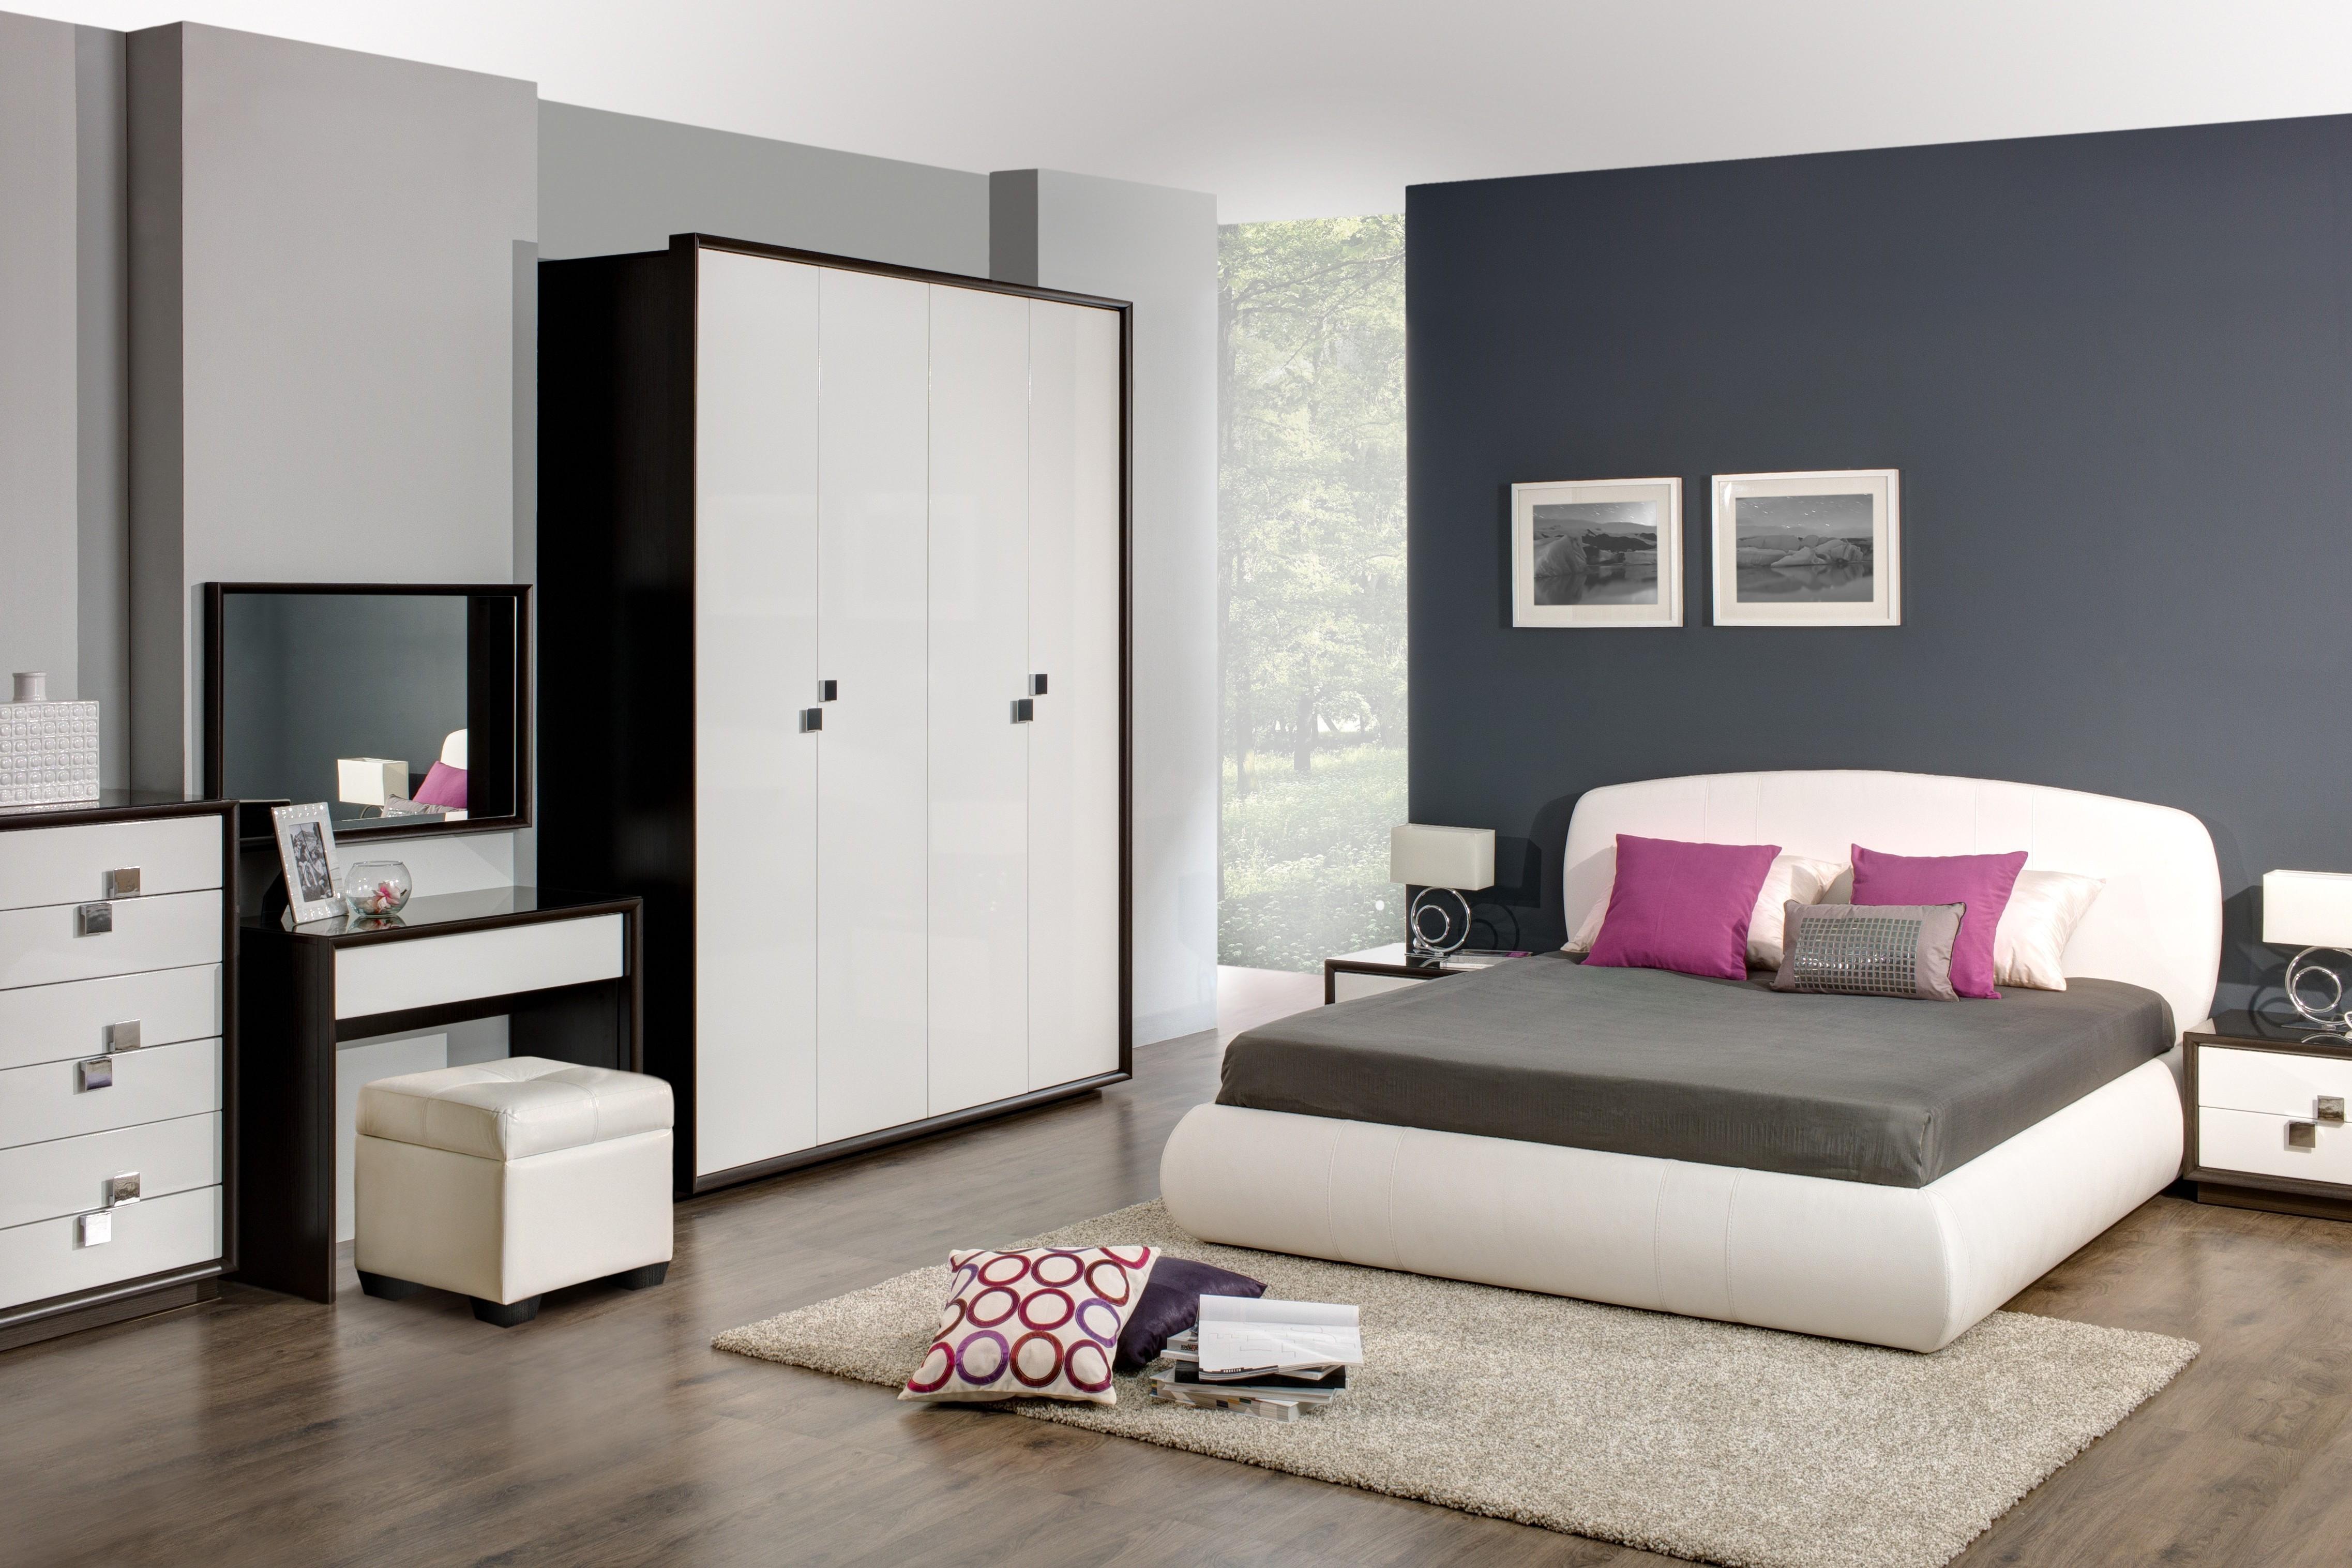 Спальня Брио 3 Ангстрем фото